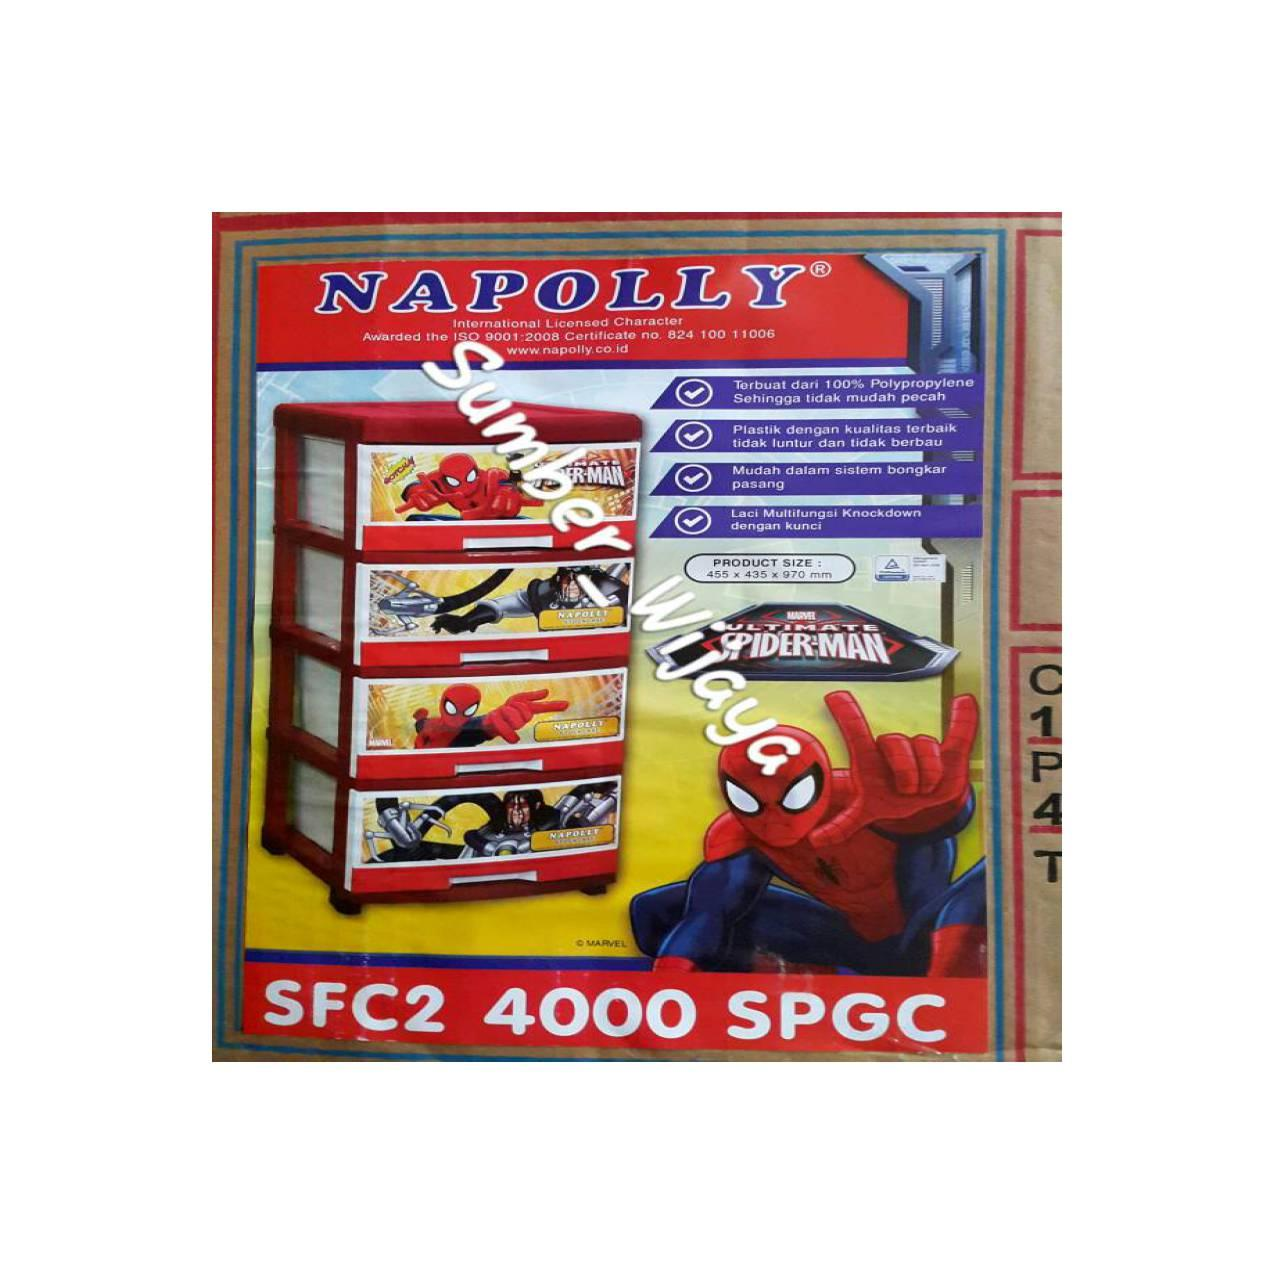 Lemari Laci Plastik Napolly Susun 4 - Spiderman SFC2 4000 SPGC